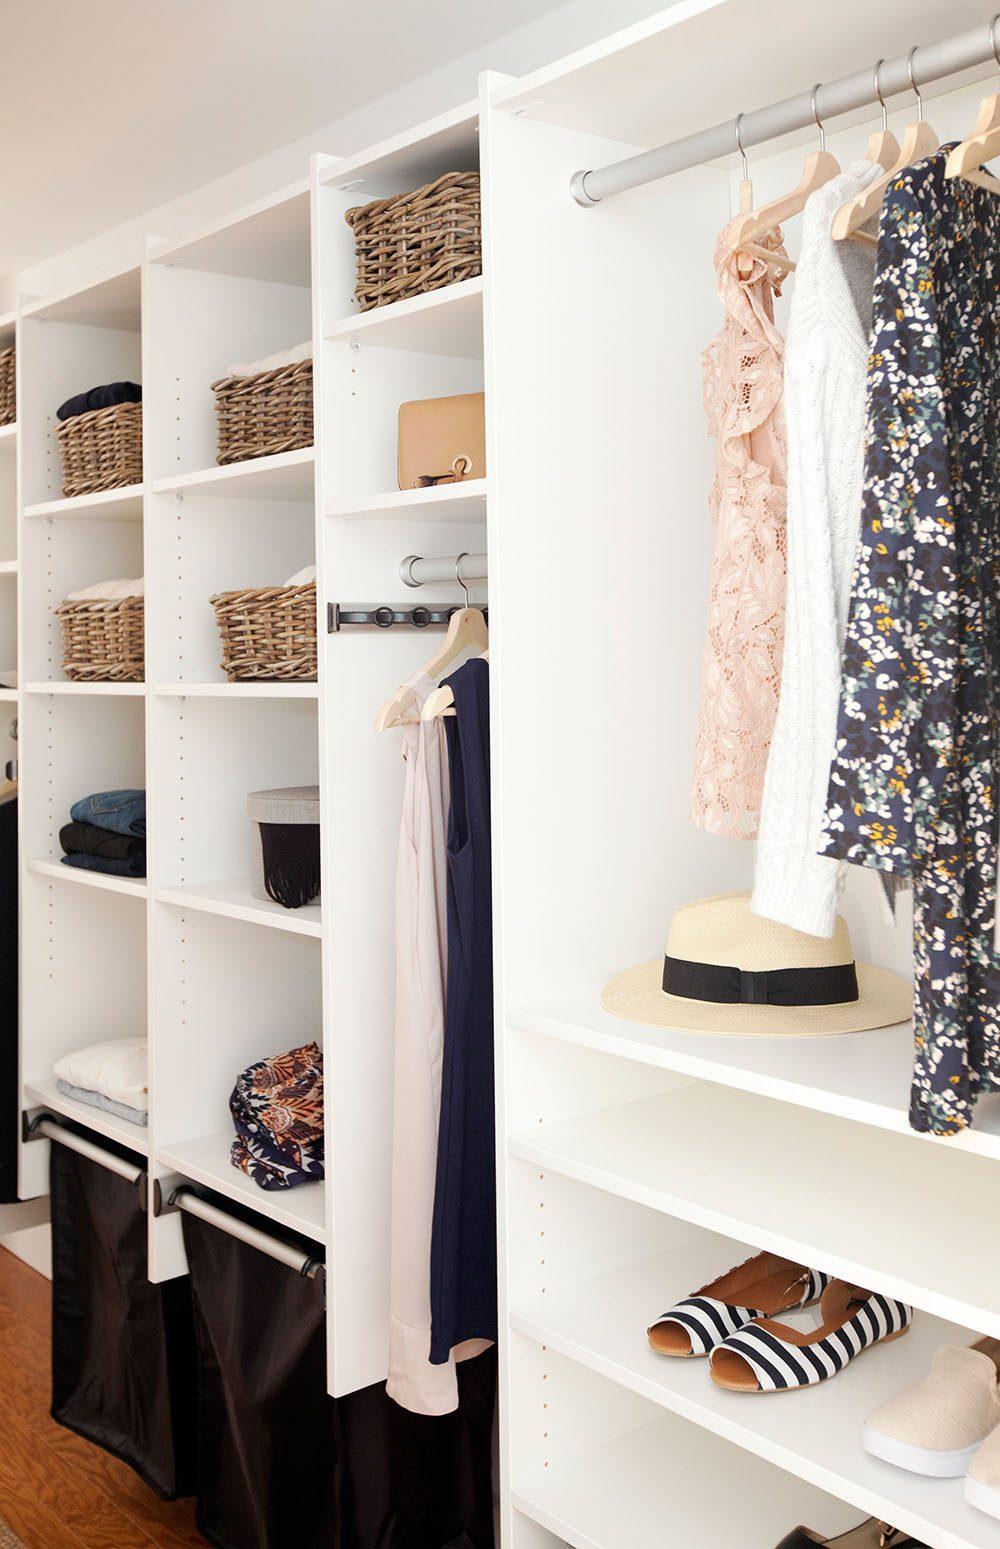 love-it-or-list-it-master-bedroom-walk-in-closet